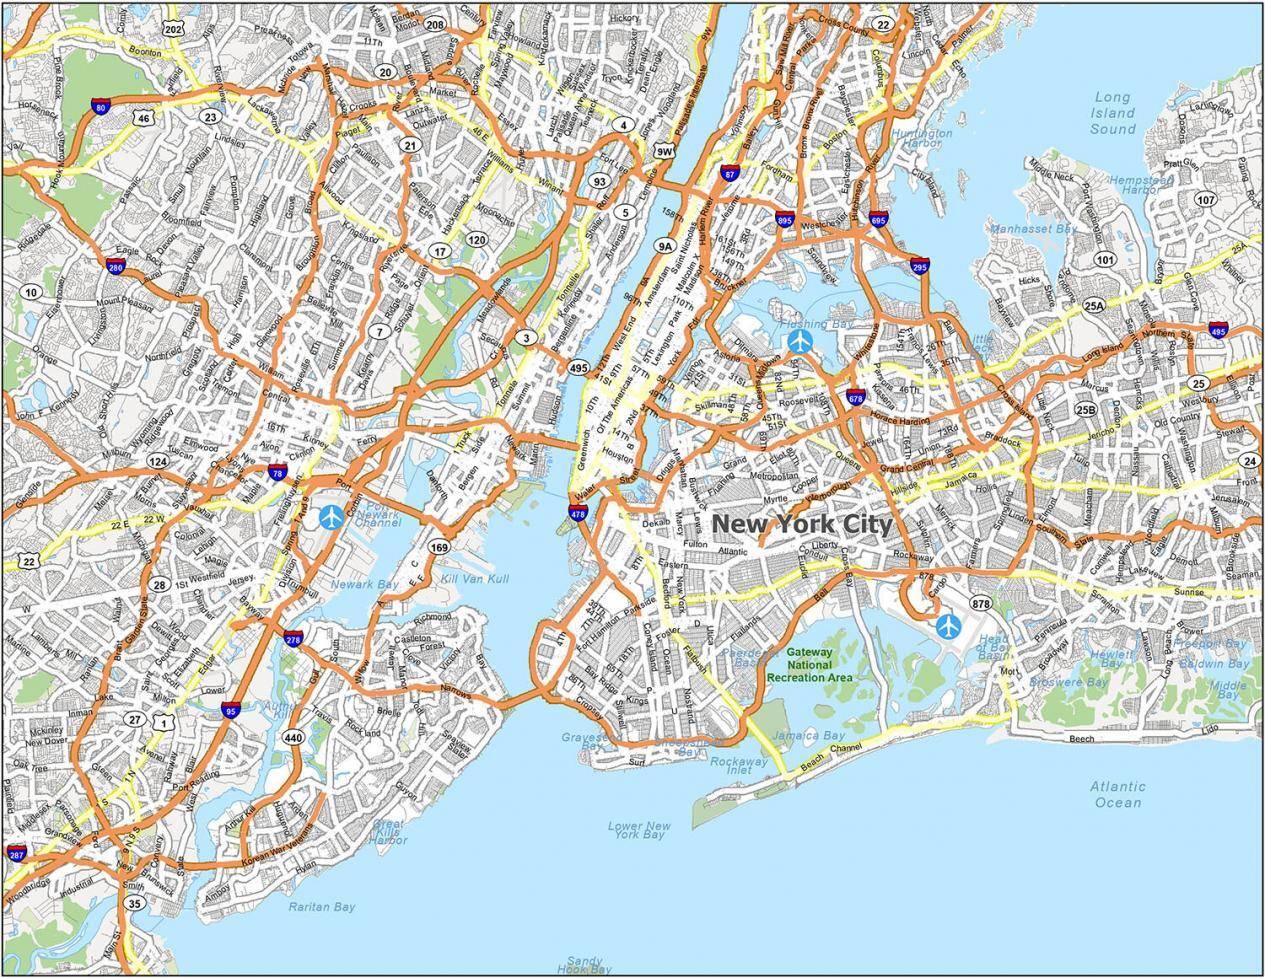 New York City Road Map